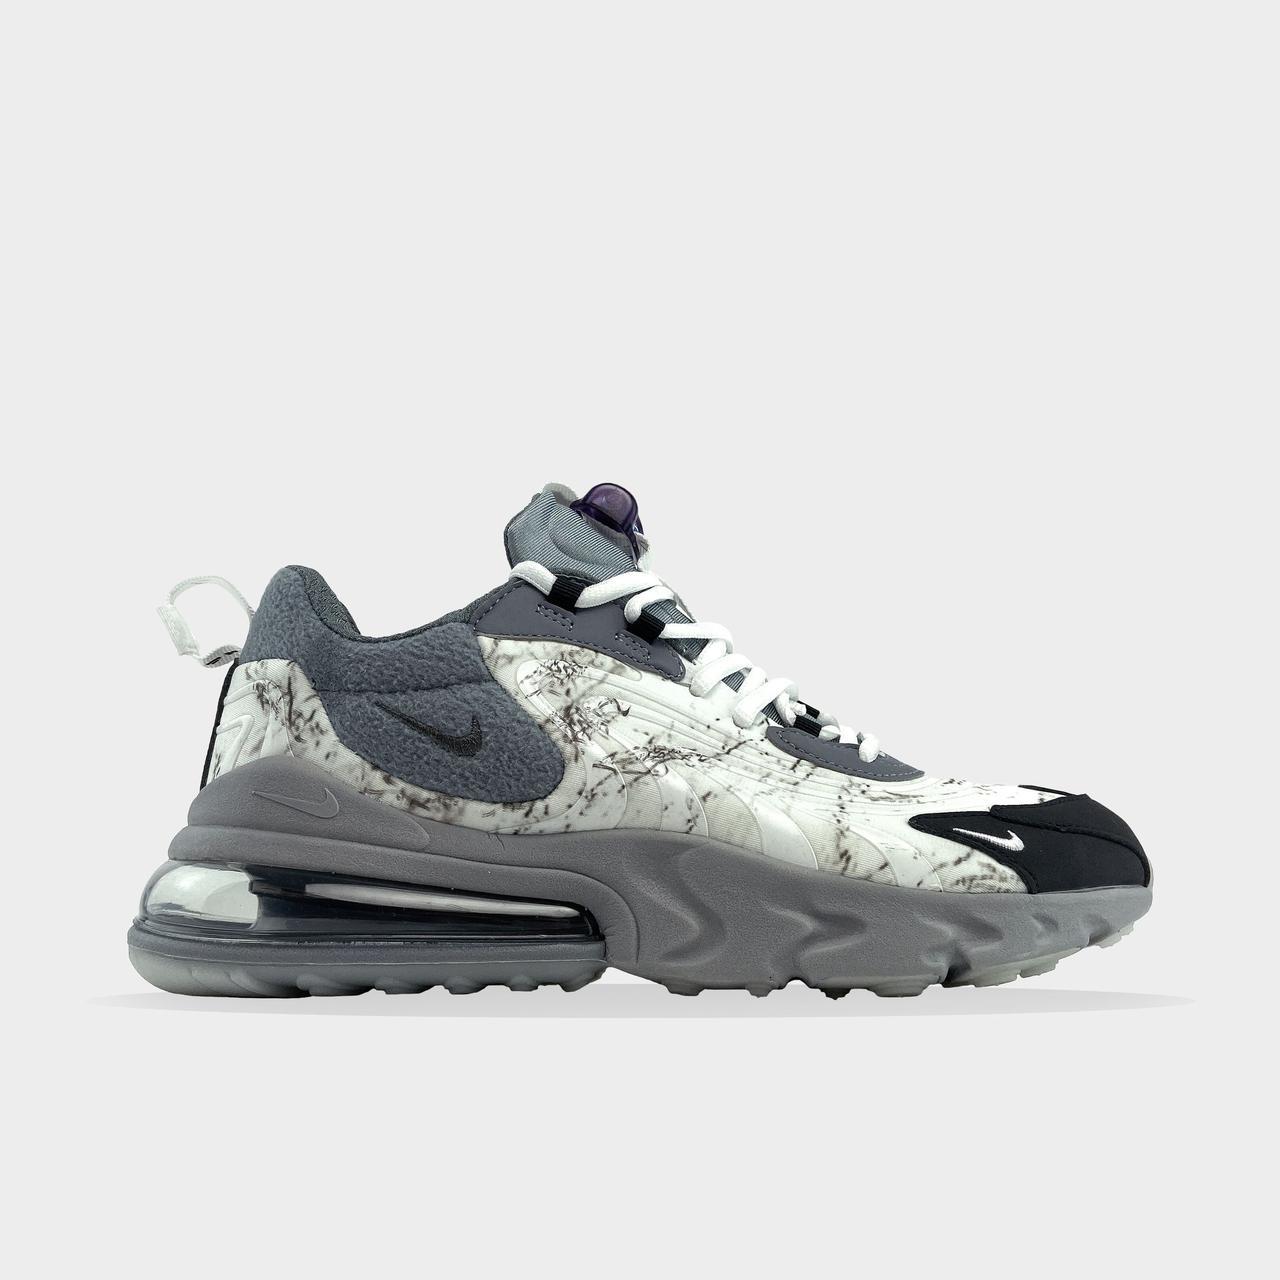 Nk, крос, обувь, взуття, sneakers, шузы, Air Max 270 React X Travis Scott (Серый)